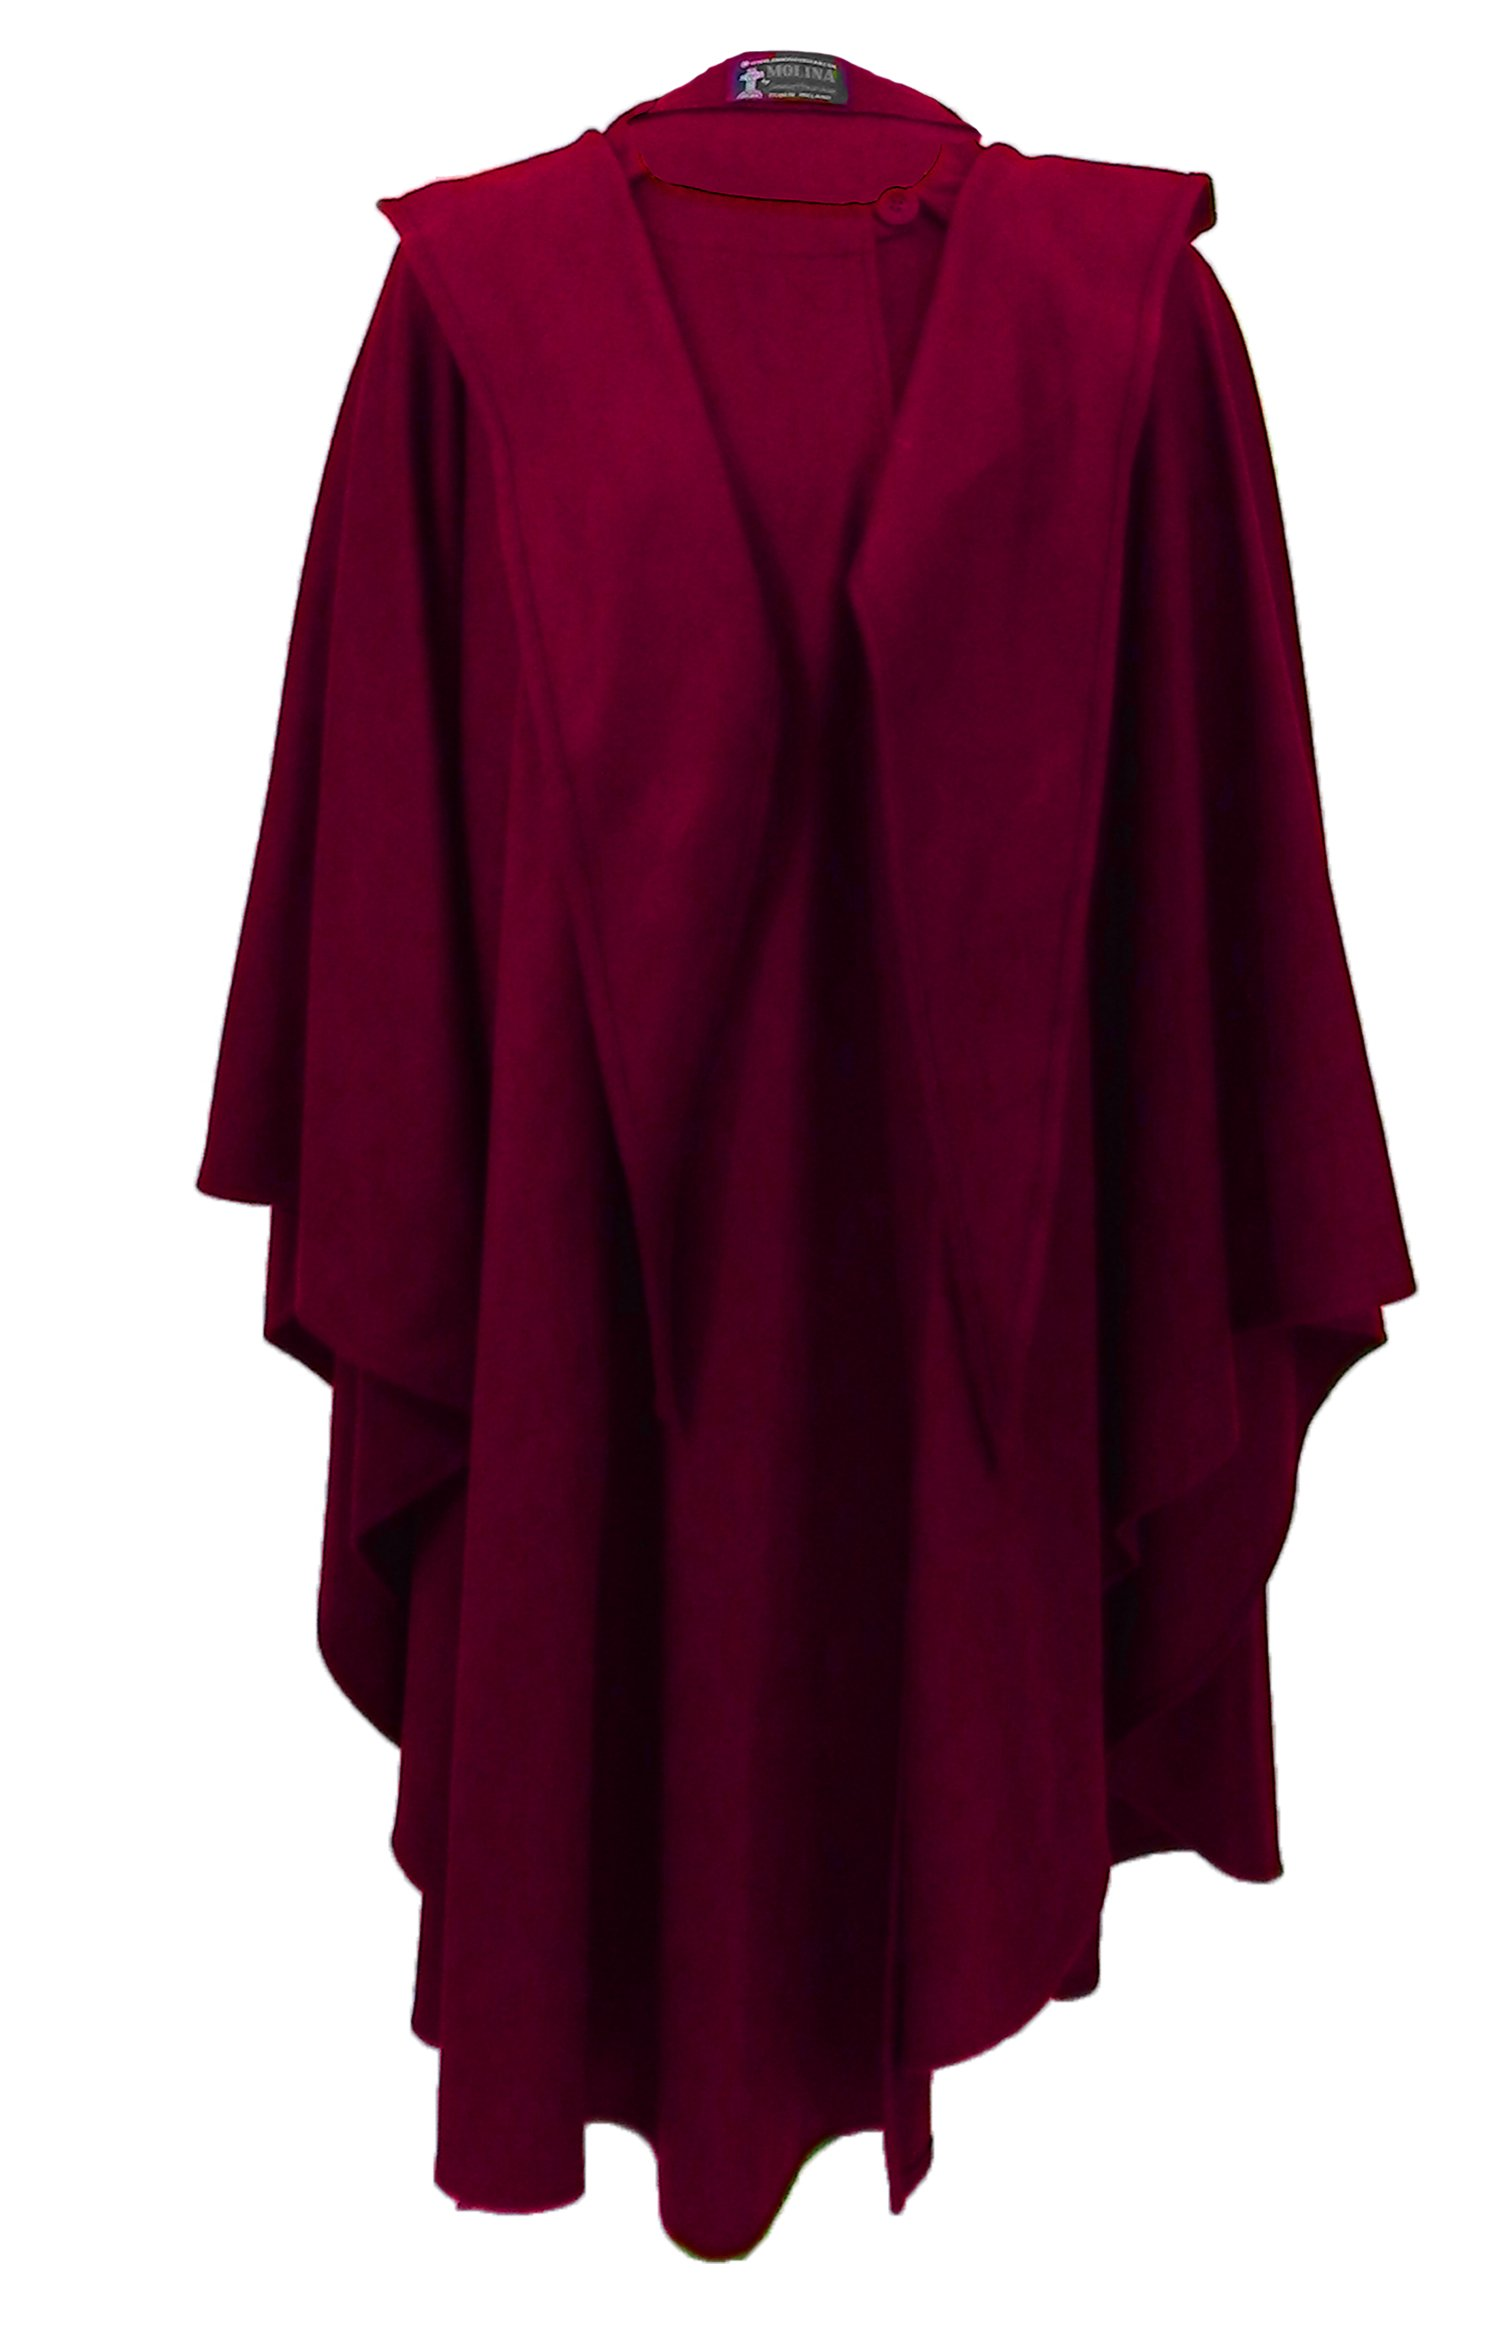 Ladies Knee Length Wool and Cashmere Cape by Irish Designer Jimmy Hourihan by The Irish Store - Irish Gifts from Ireland